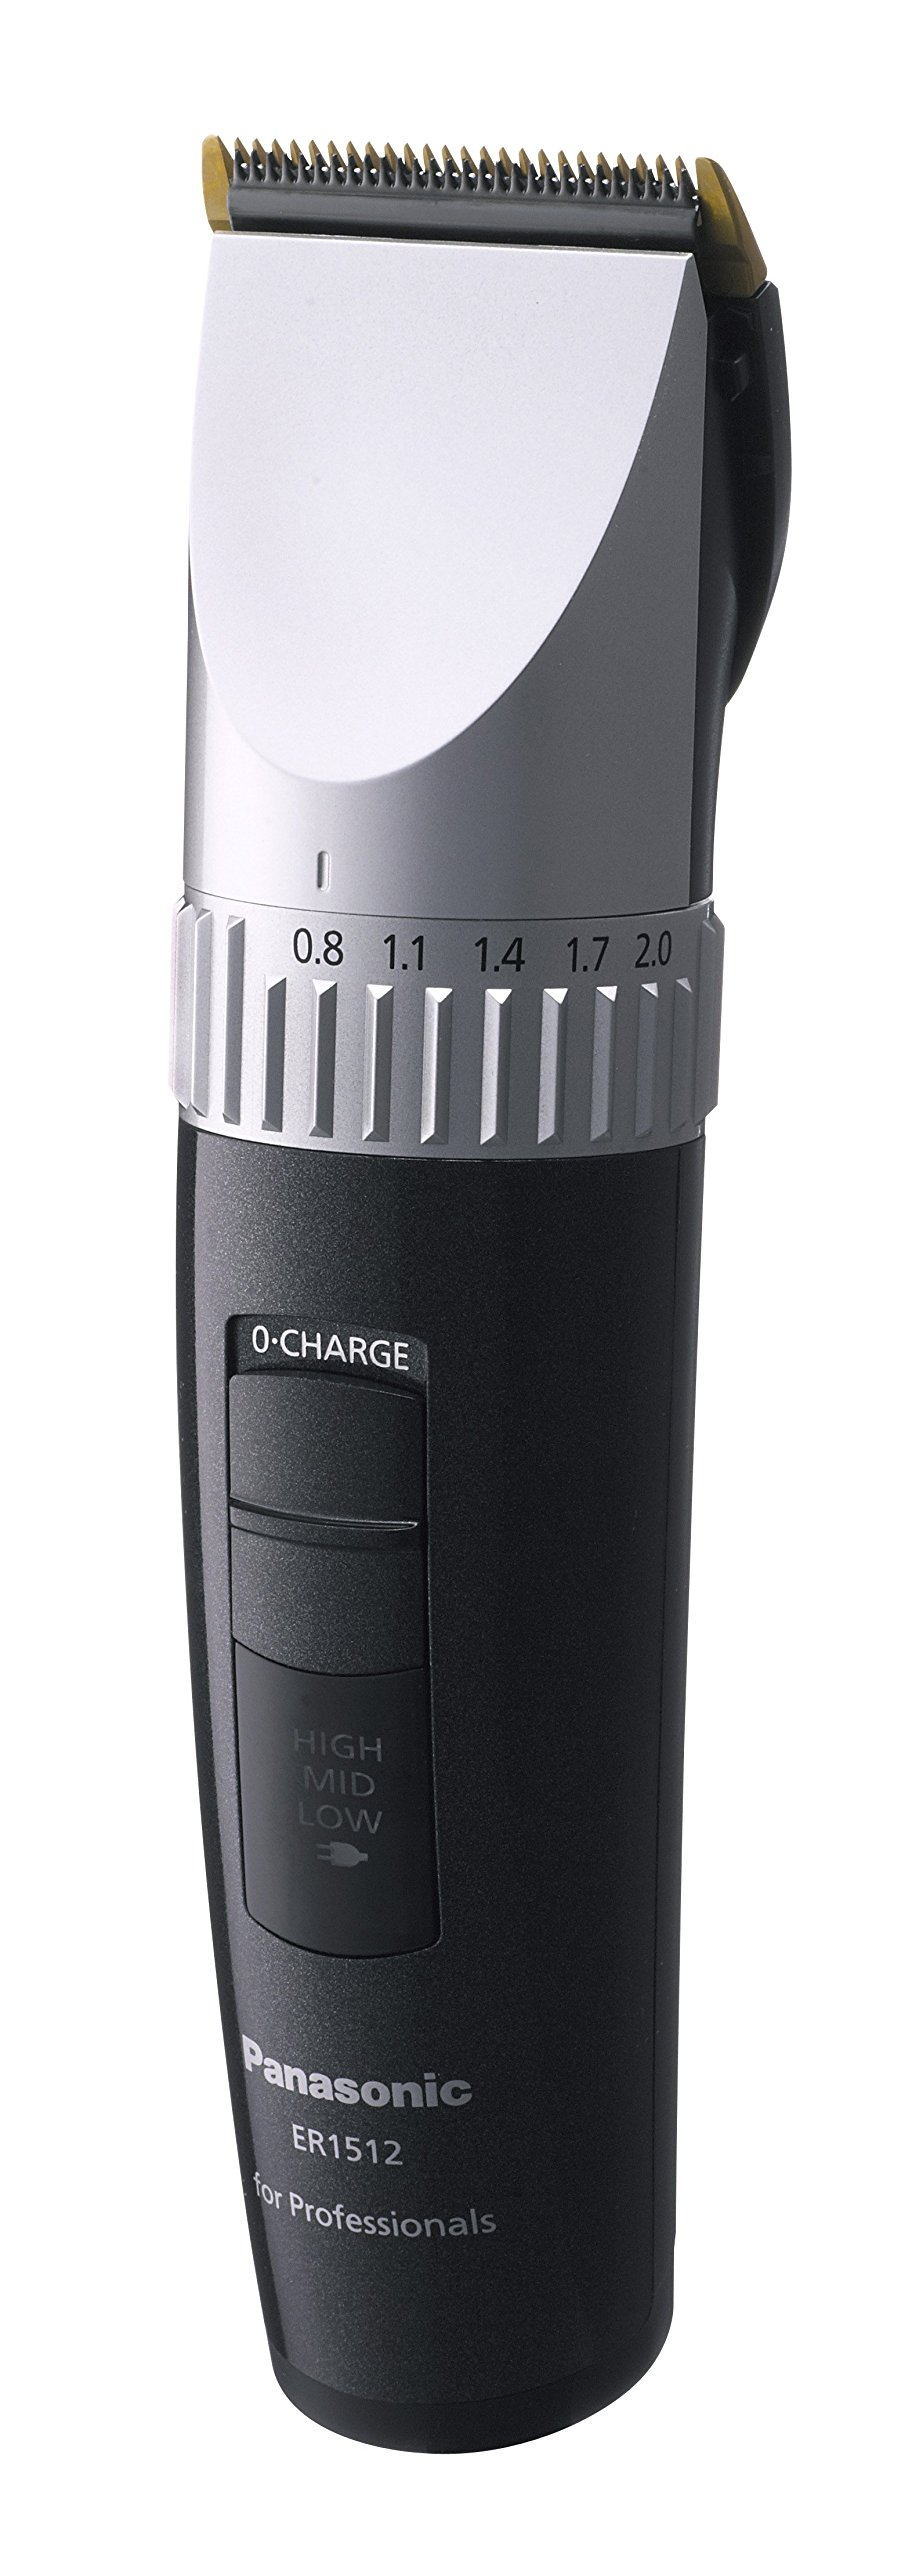 Panasonic Tondeuse Professionnelle ER-1512 product image